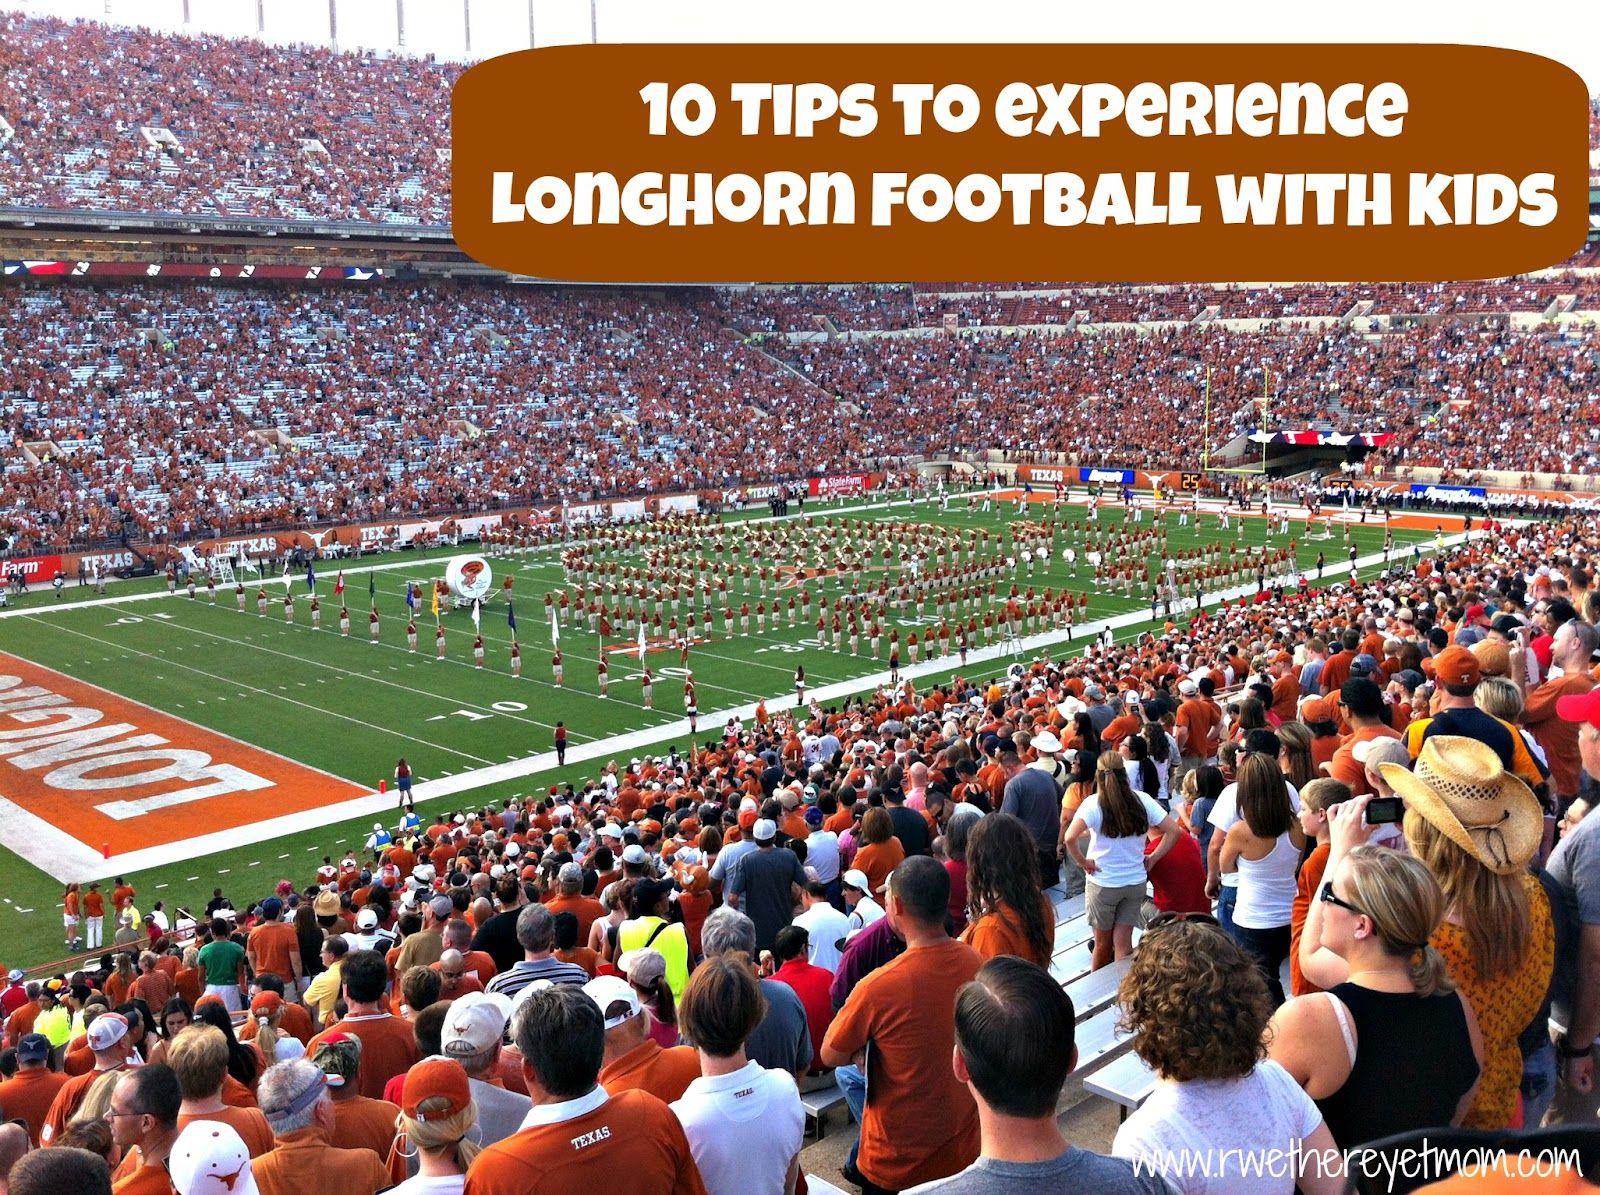 10 Tips For Ut Longhorns Football Game With Kids Longhorns